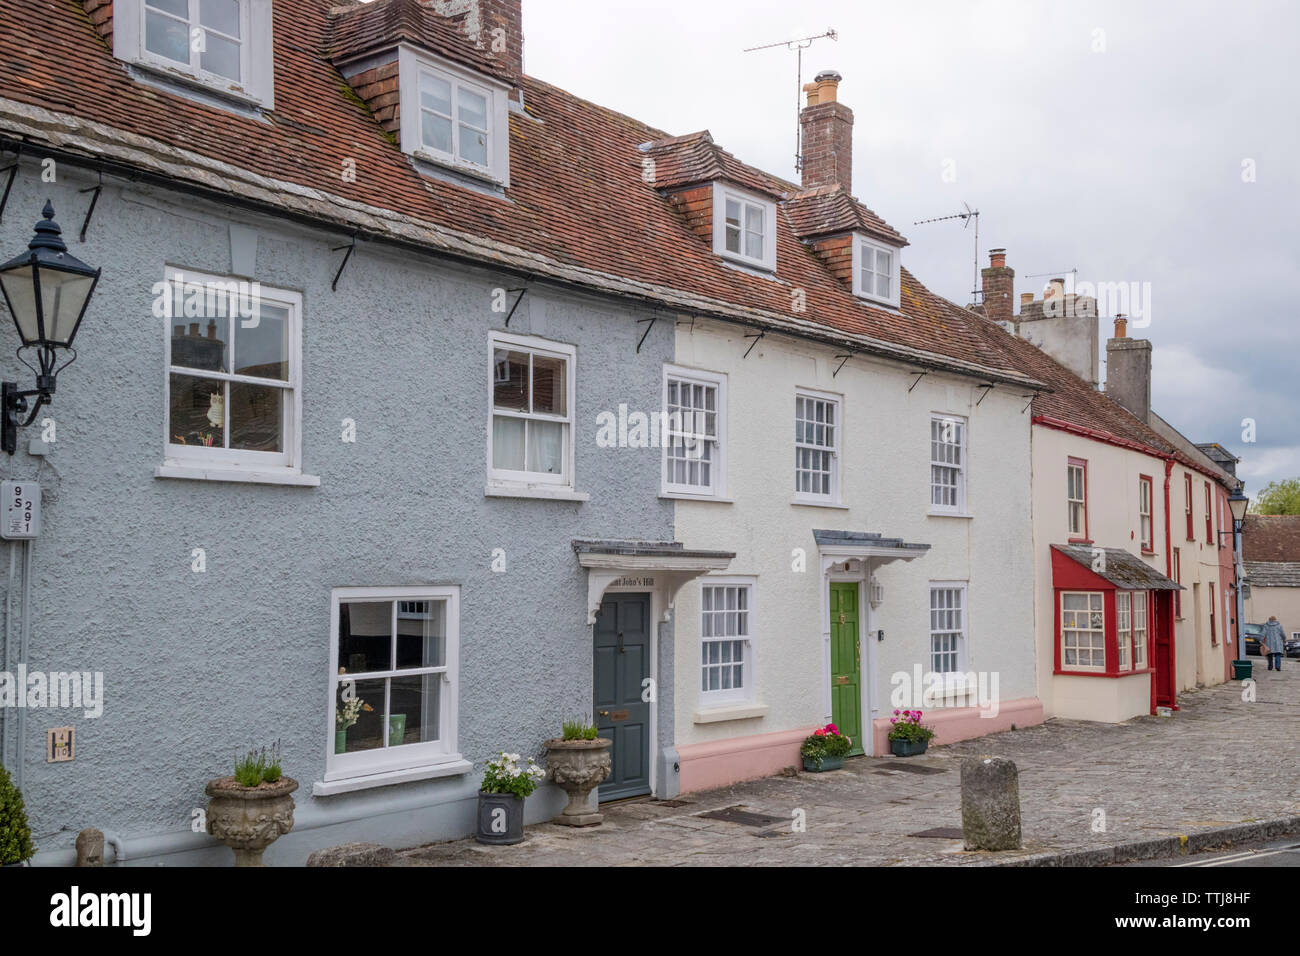 Historic cottages in Wareham, Dorset, England, UK - Stock Image